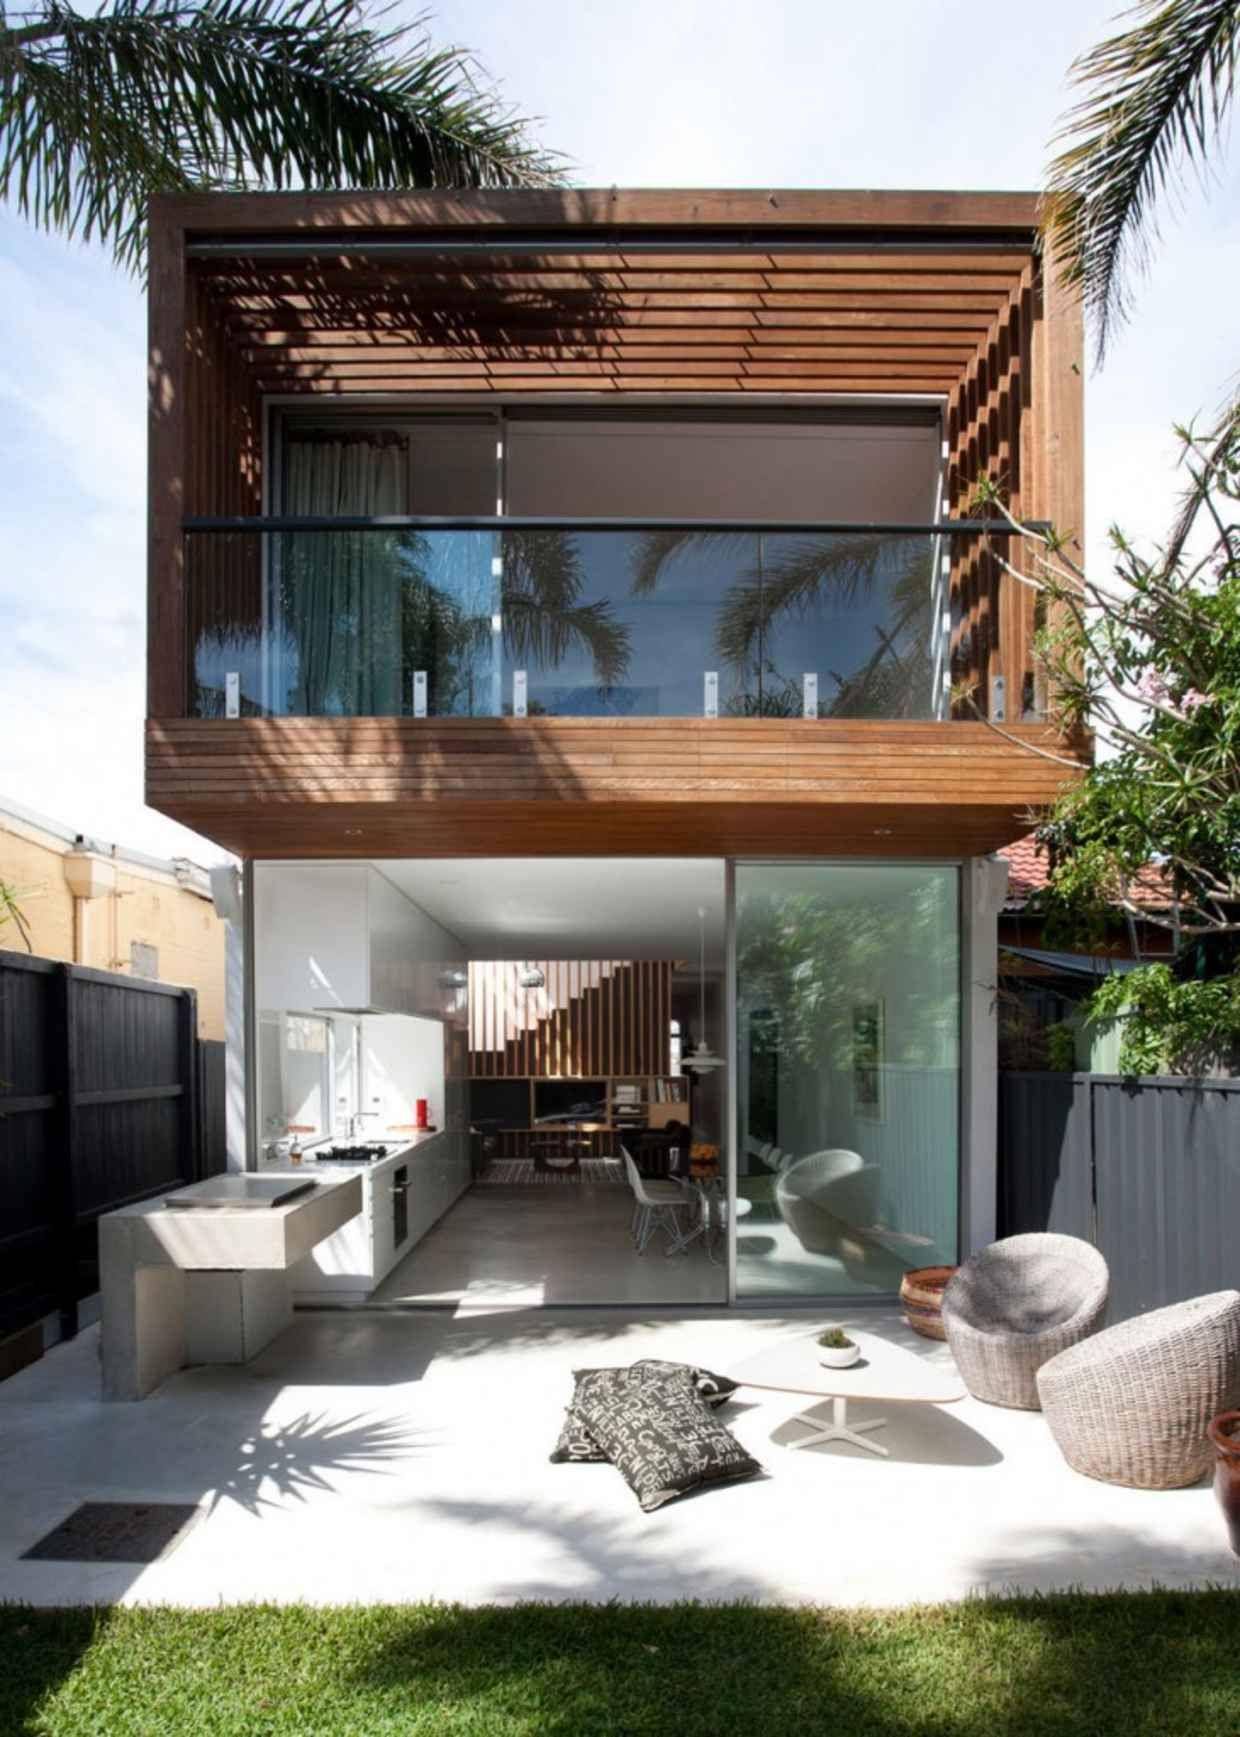 Contemporary Home In Sydney, Australia Contemporary Homescontemporary Architecturemodern